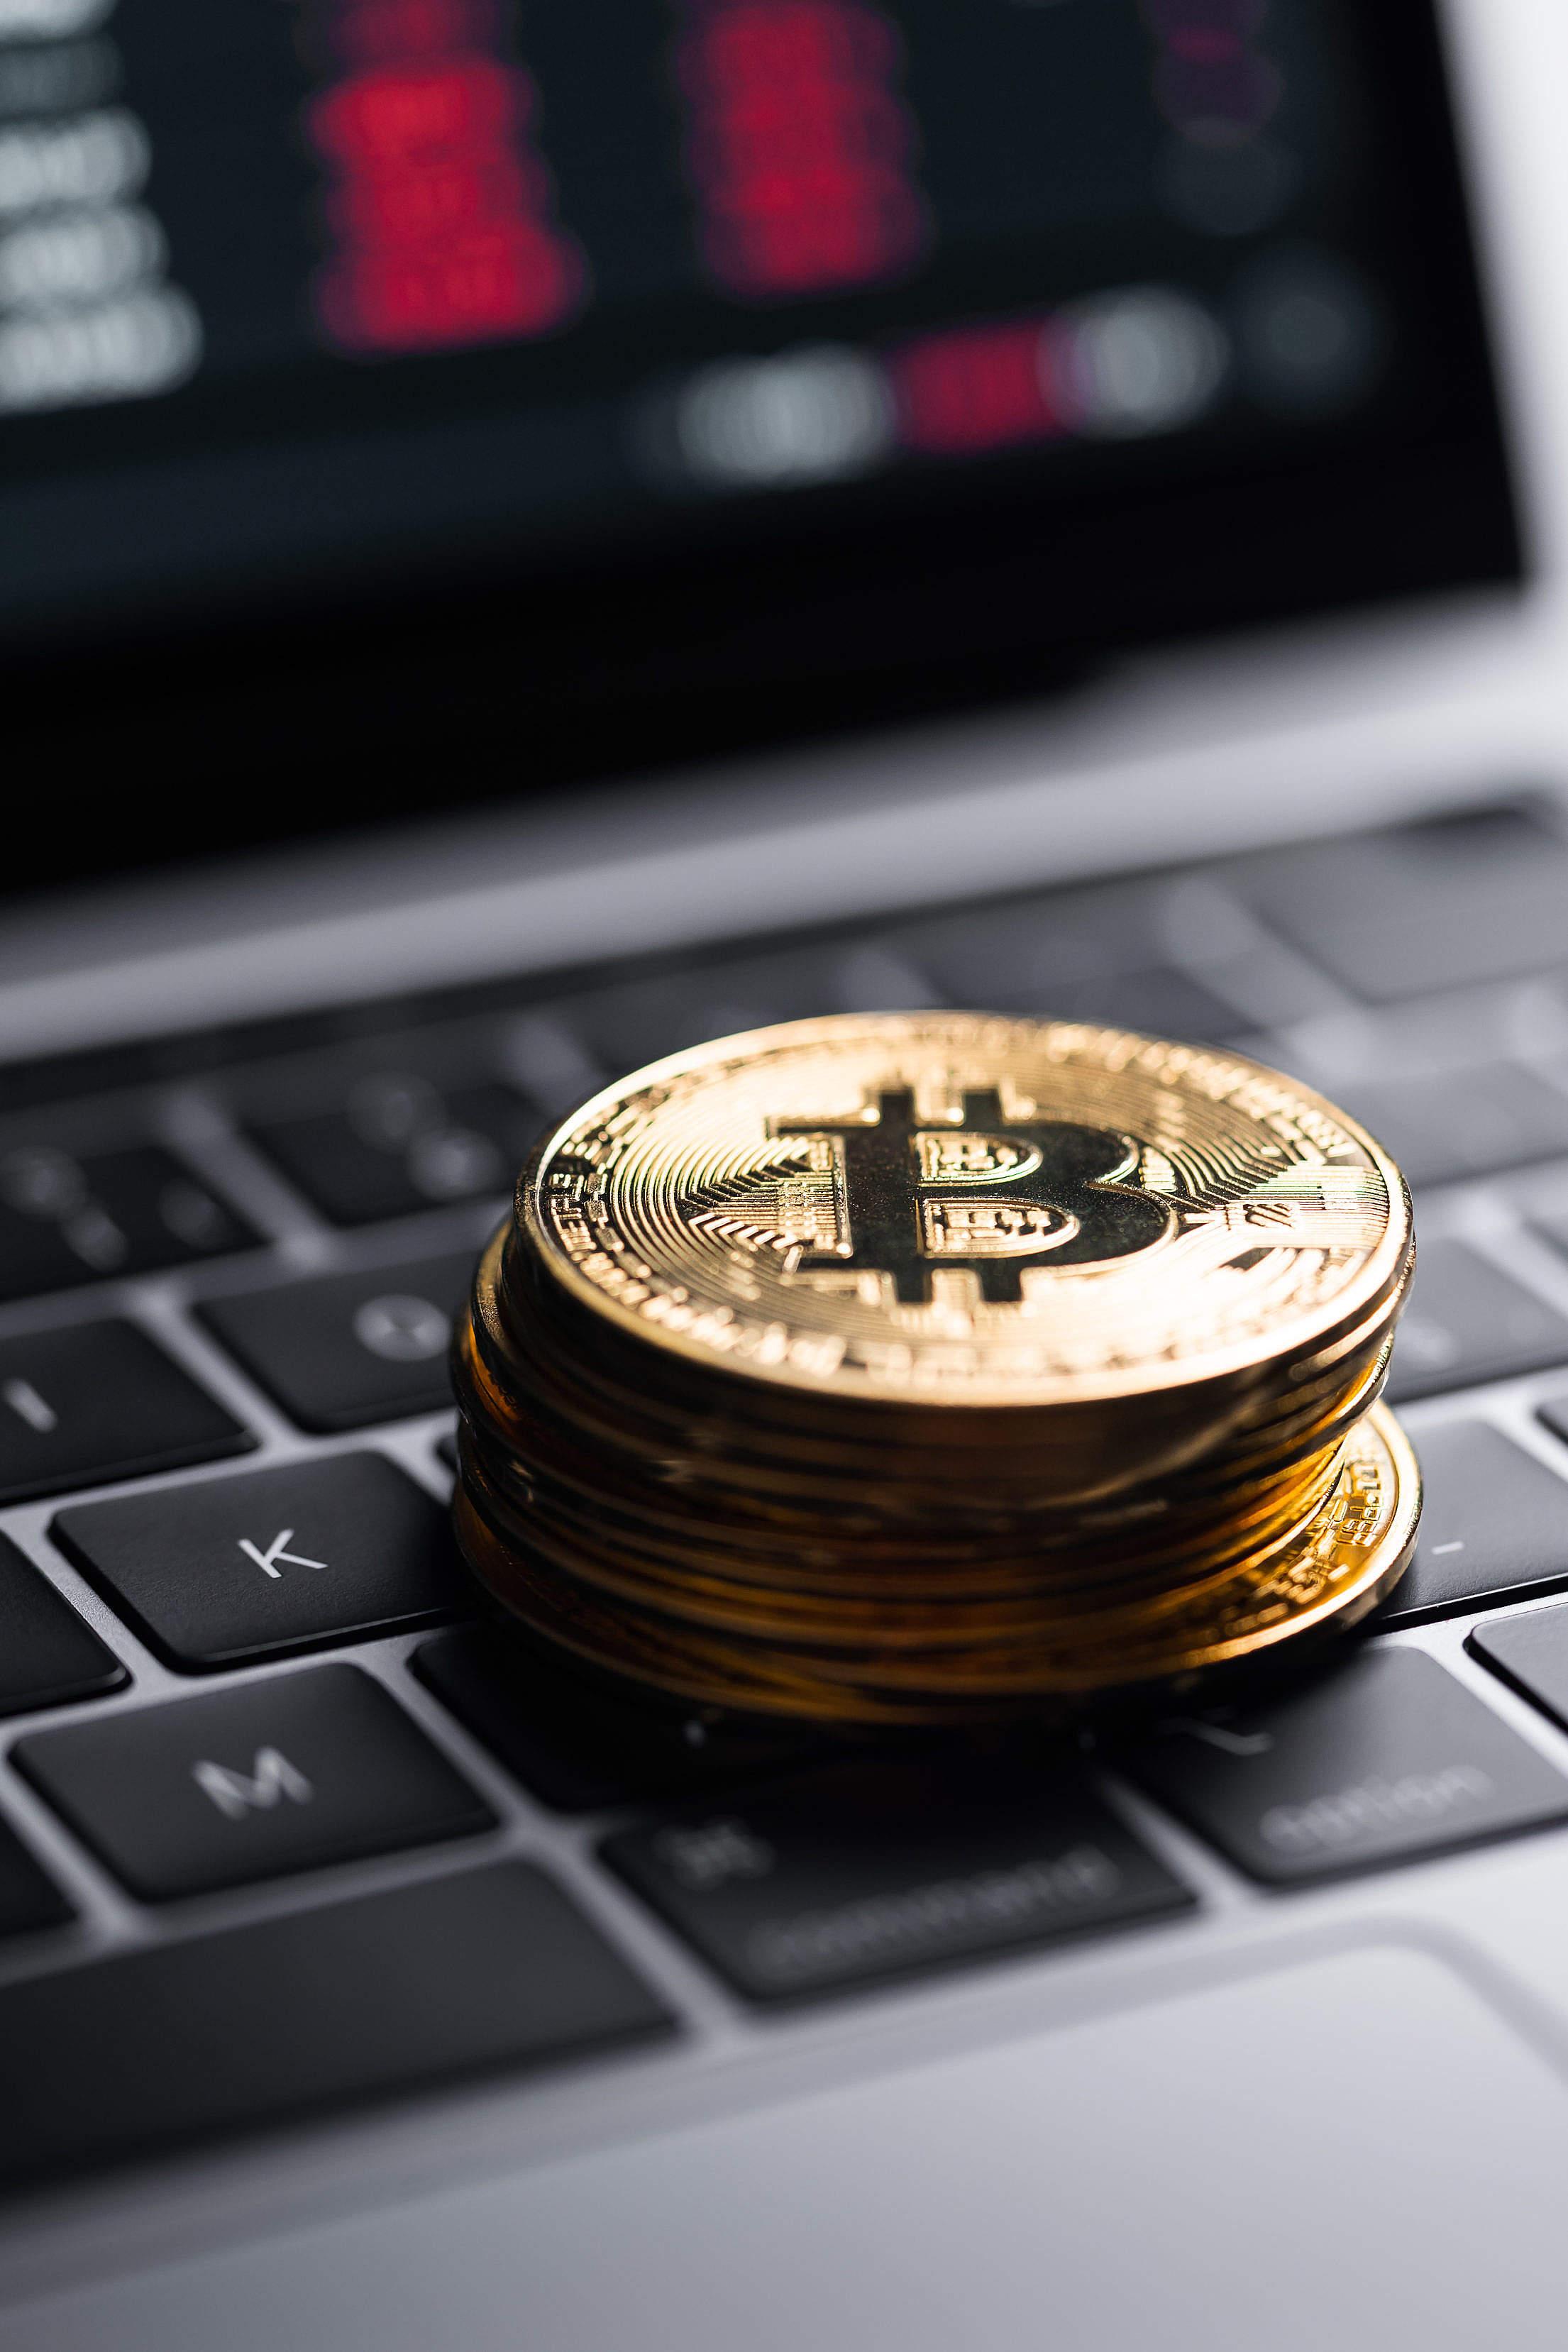 Golden Bitcoins on Laptop Free Stock Photo